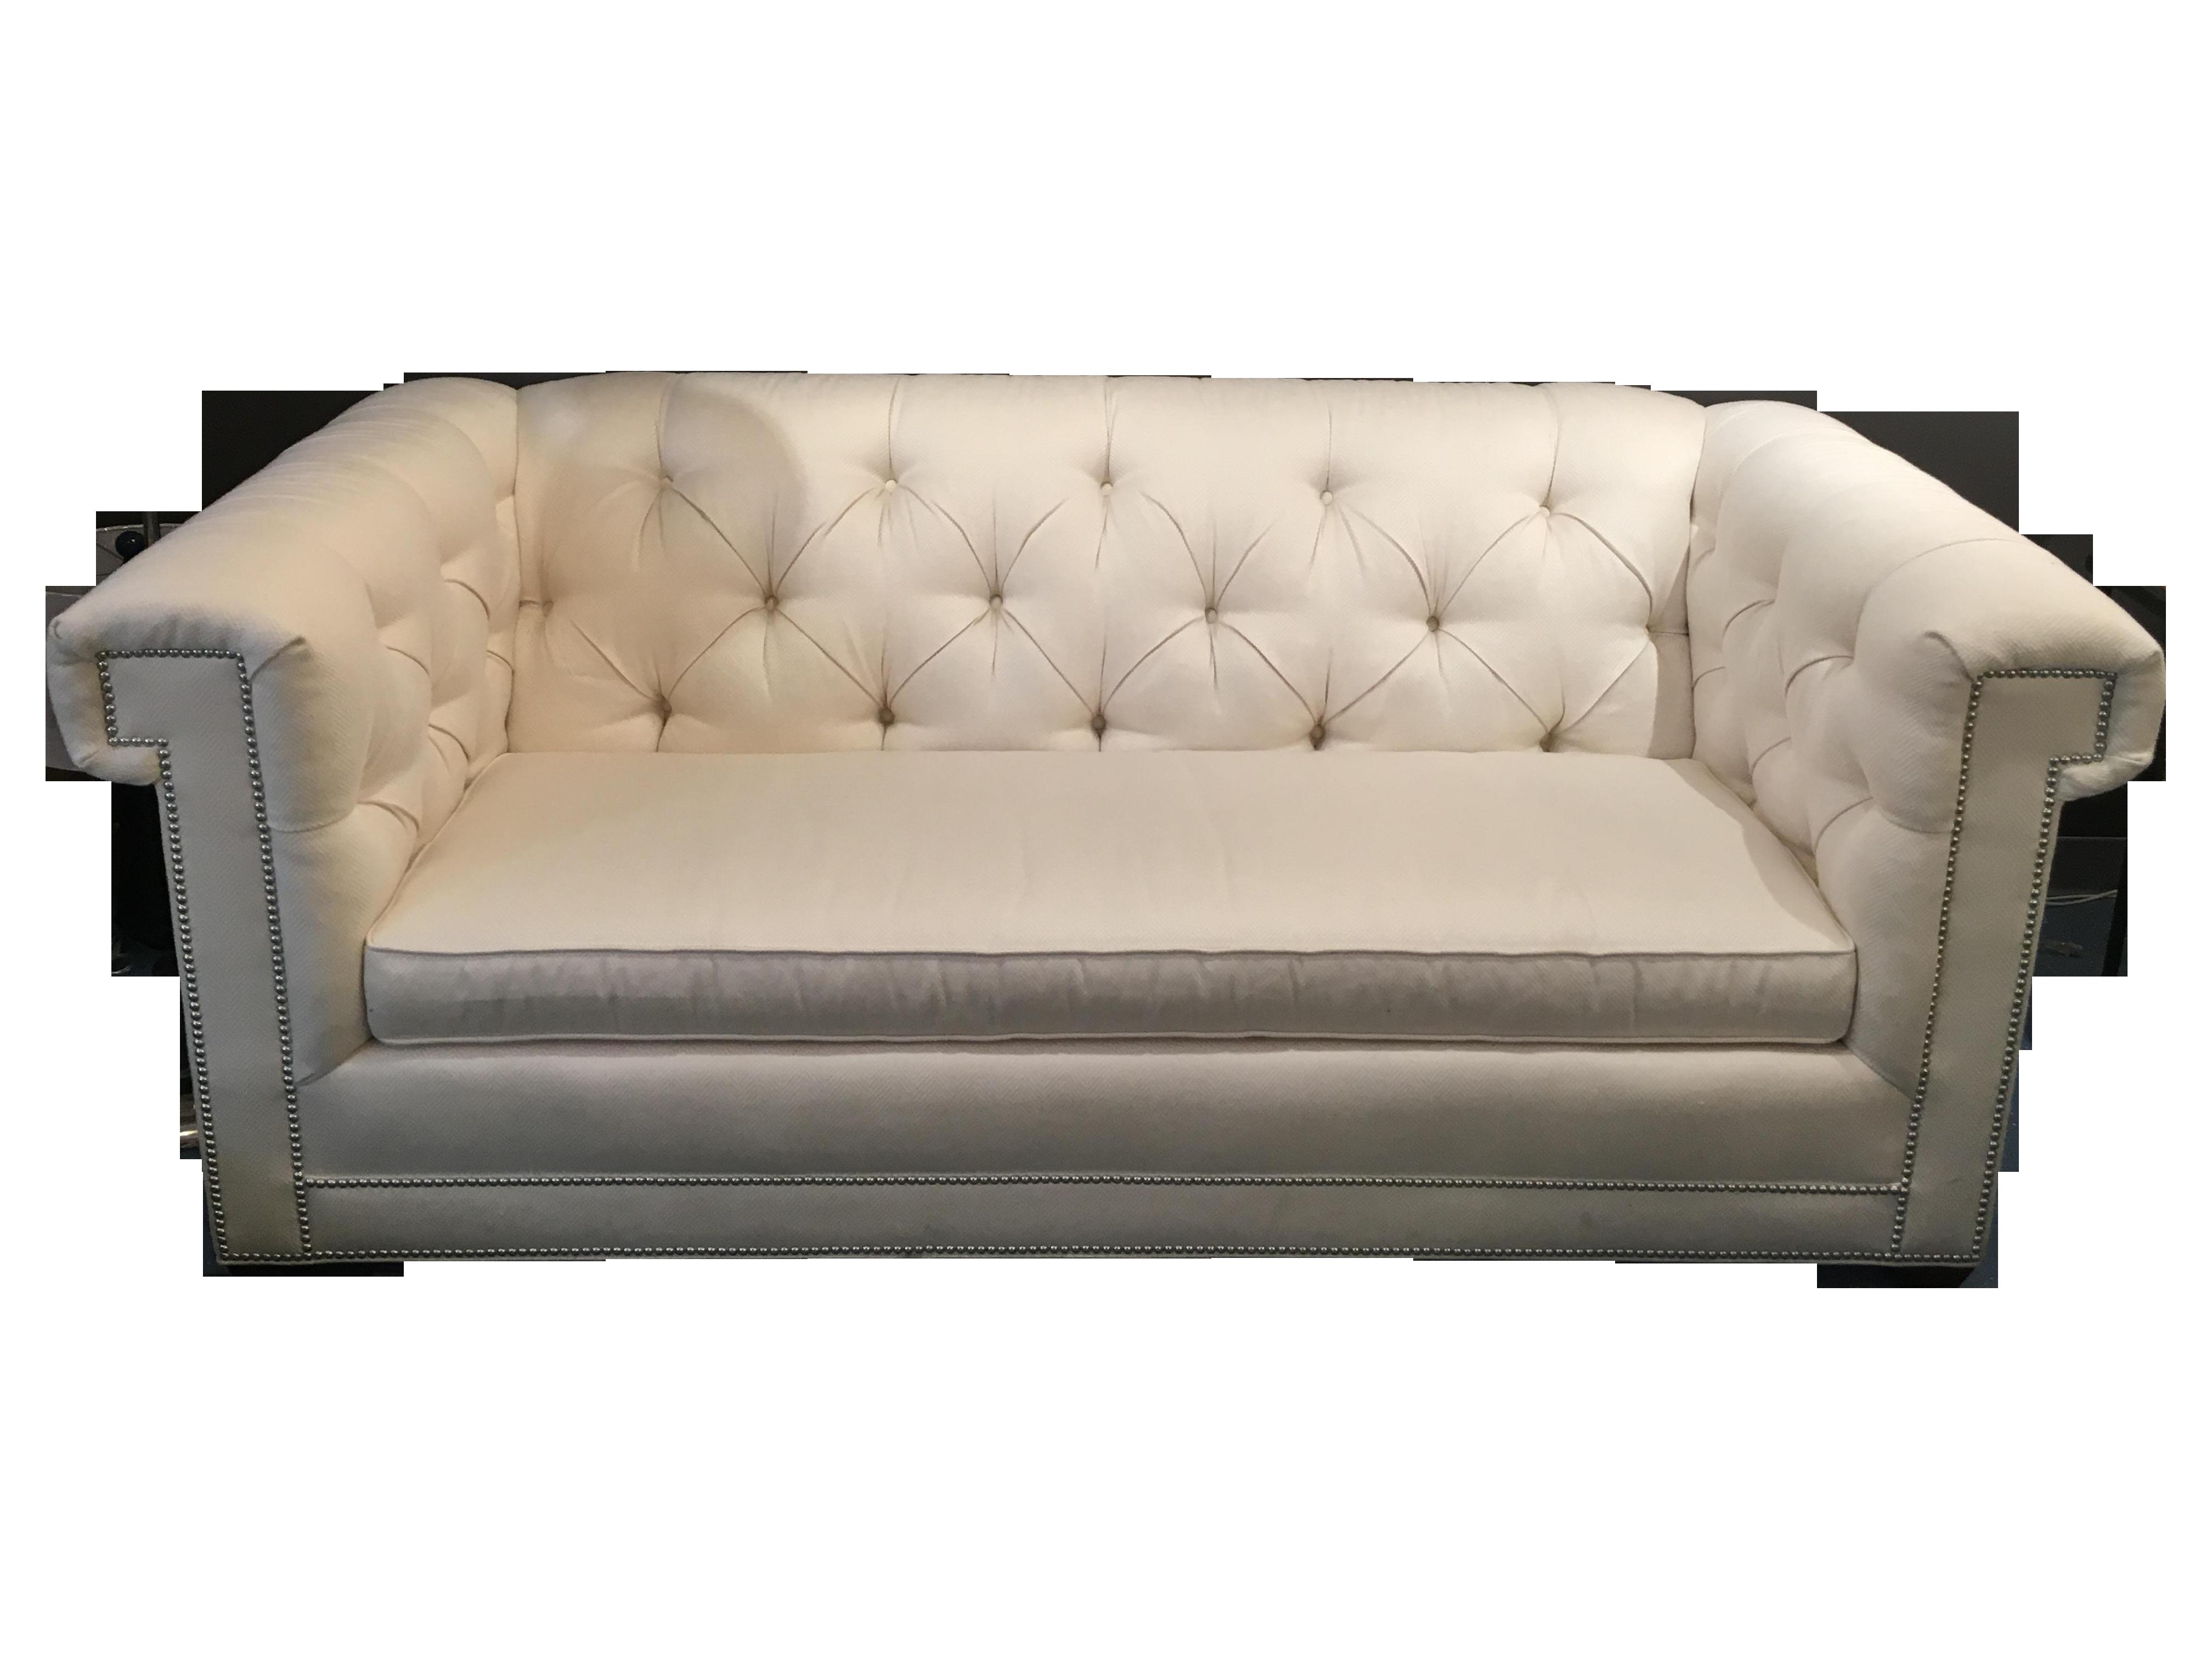 CR Laine Chesterfield Sofa White Sunbrella Fabric